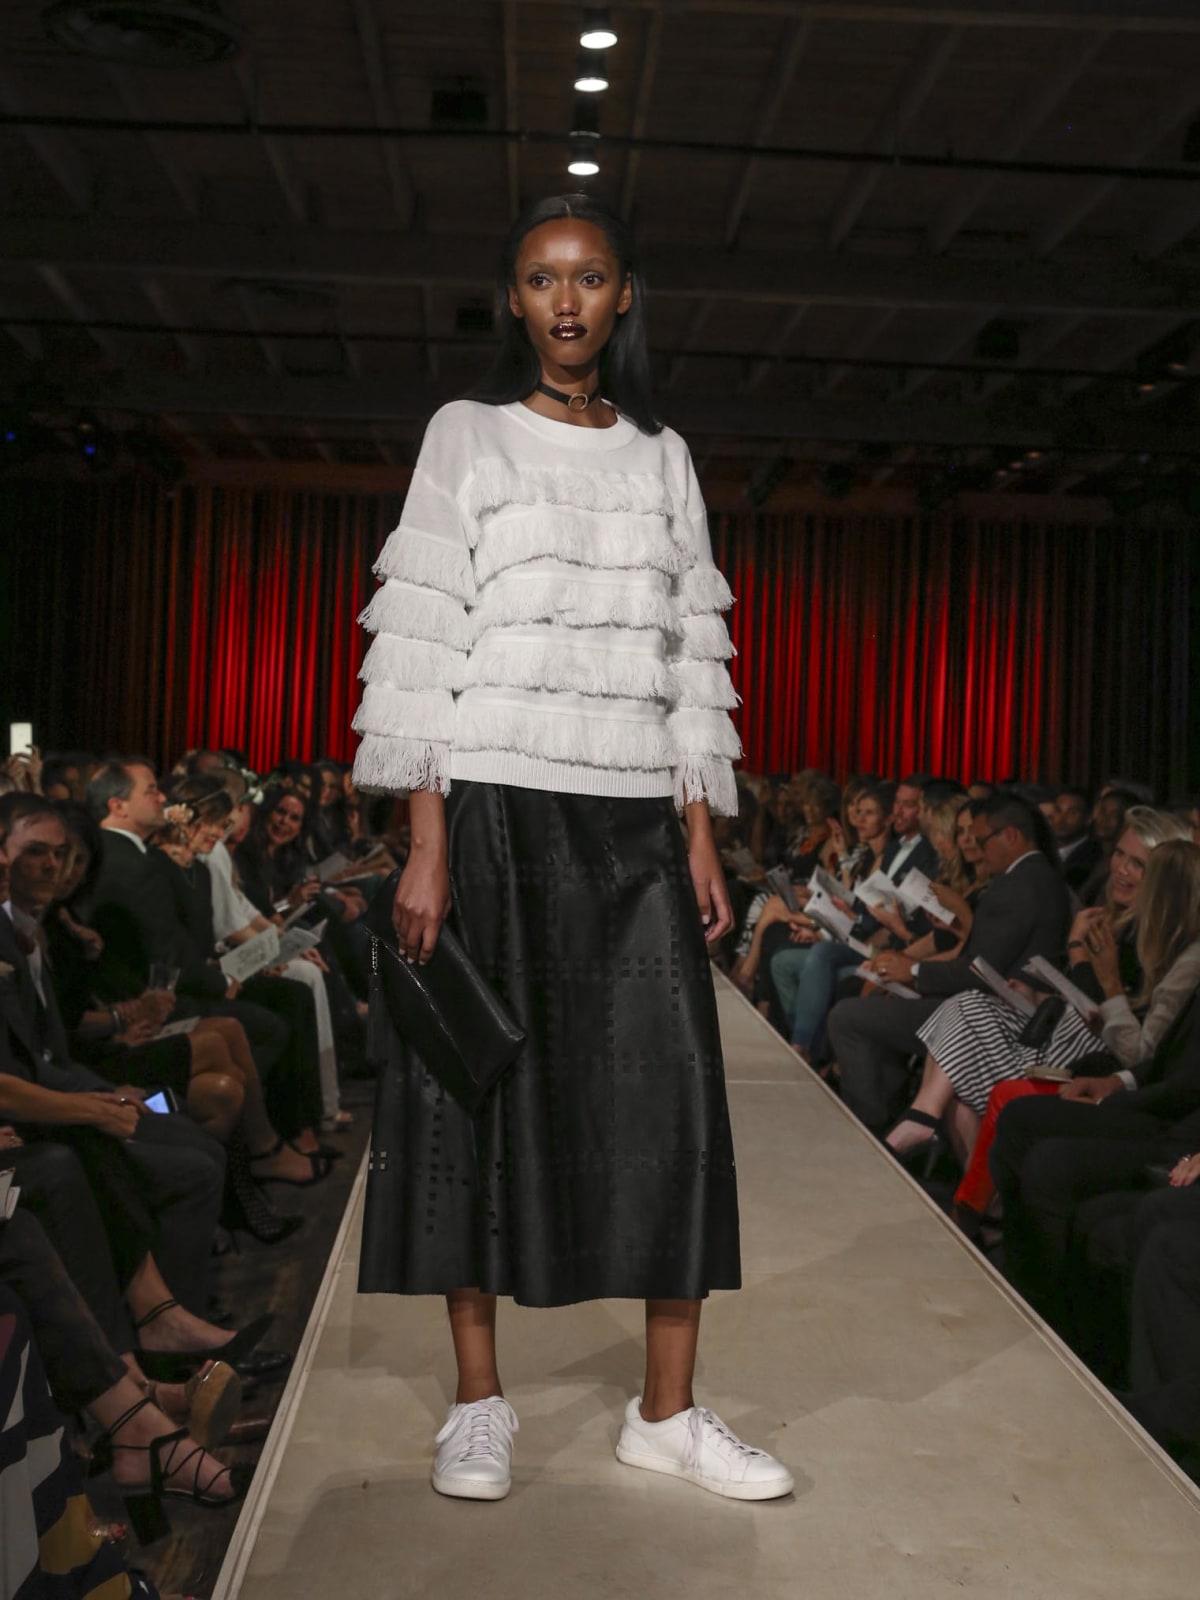 TRIBEZA Style Week Fashion Show 2016 at Brazos Hall Adelante